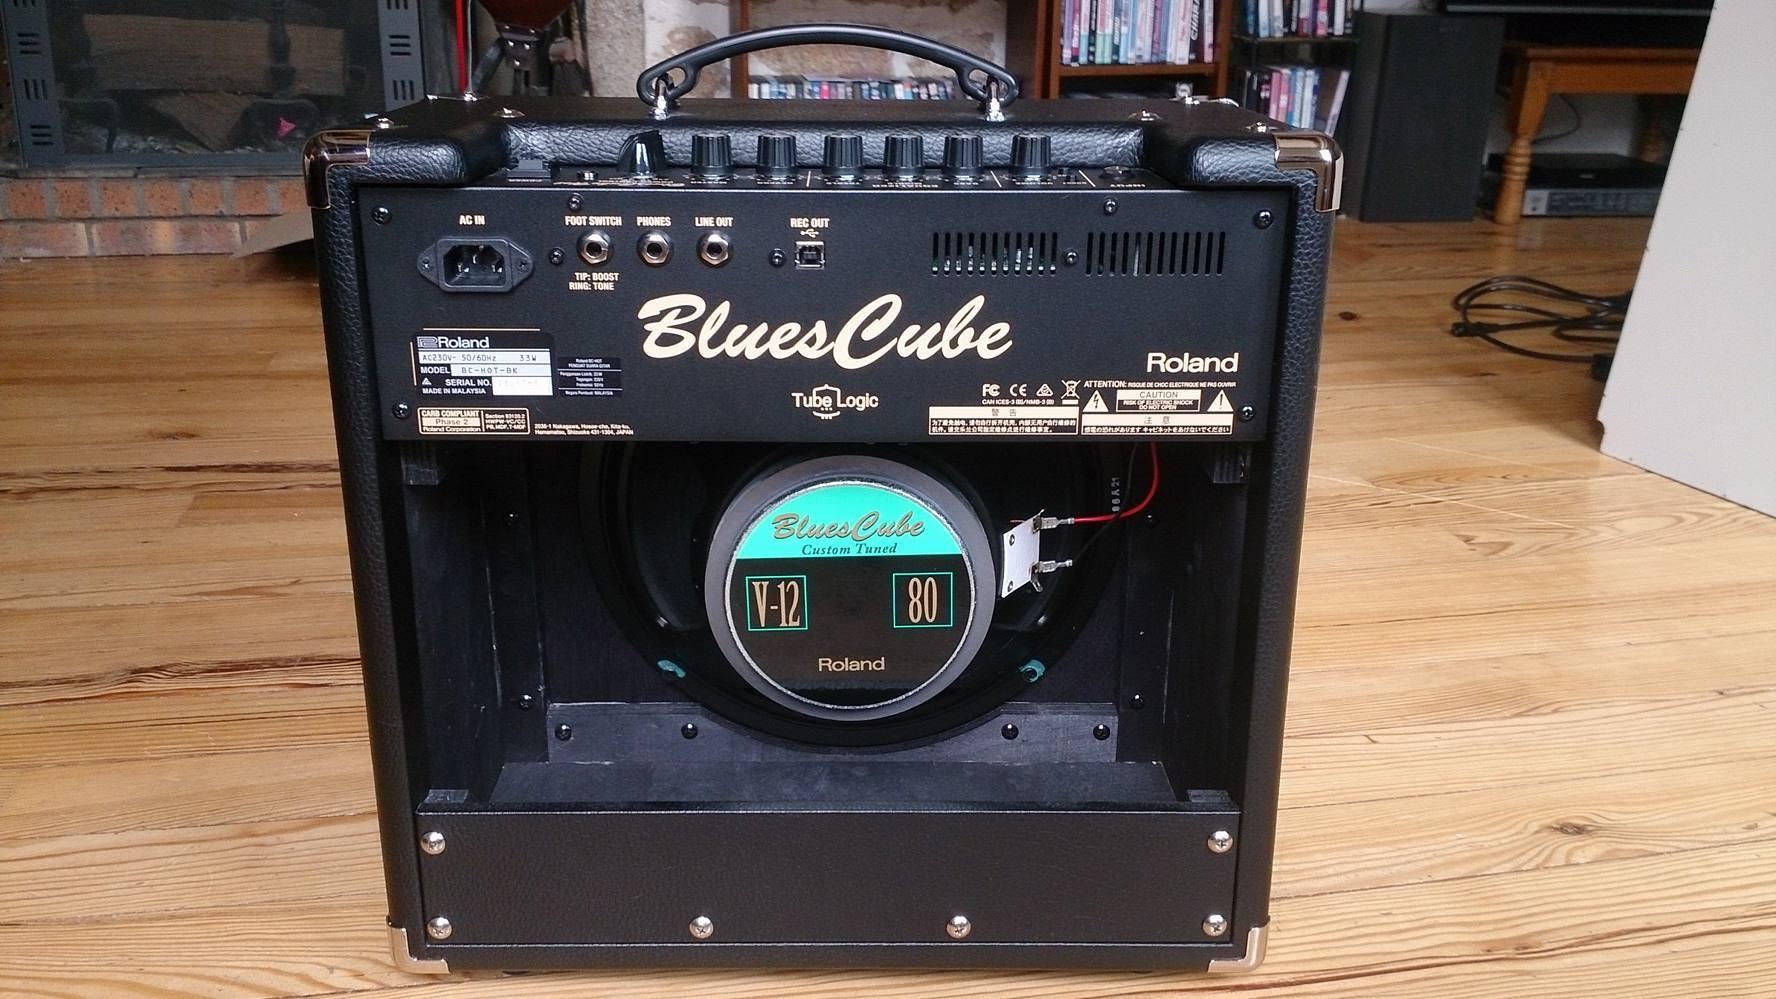 roland blues cube hot image 1803183 audiofanzine. Black Bedroom Furniture Sets. Home Design Ideas